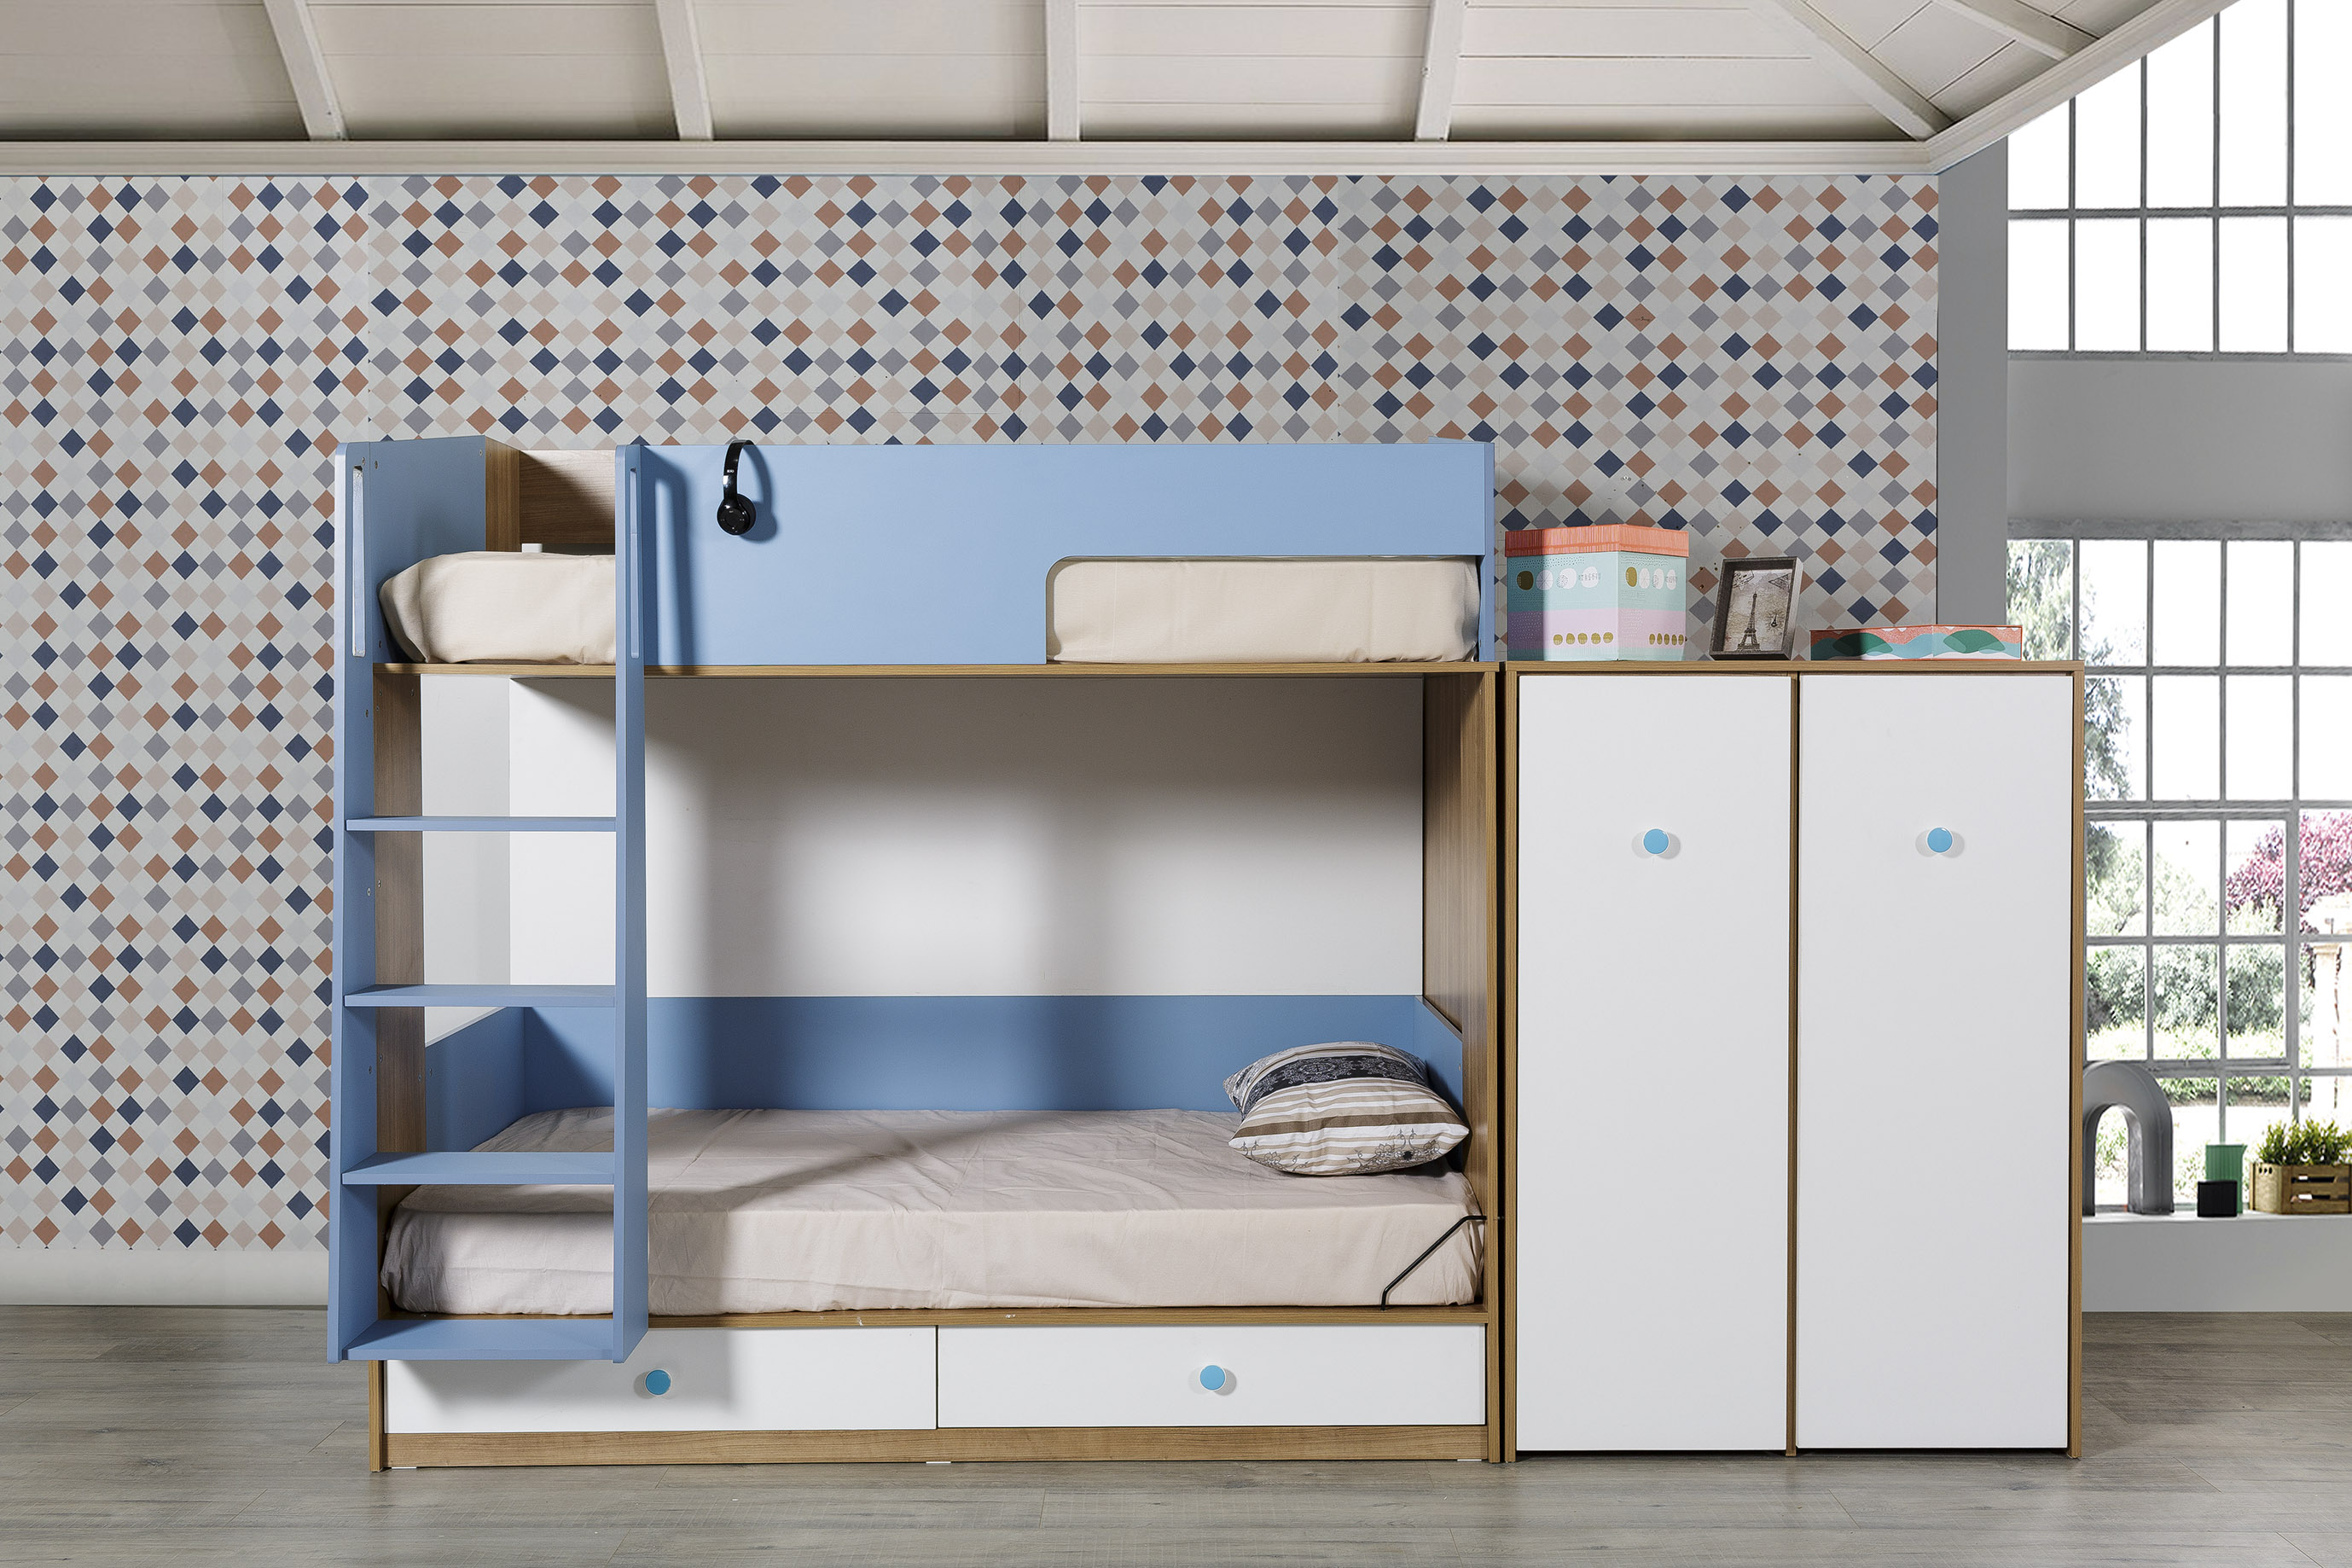 Kinderzimmer Hochbett komplett Smart 2-teilig Modern